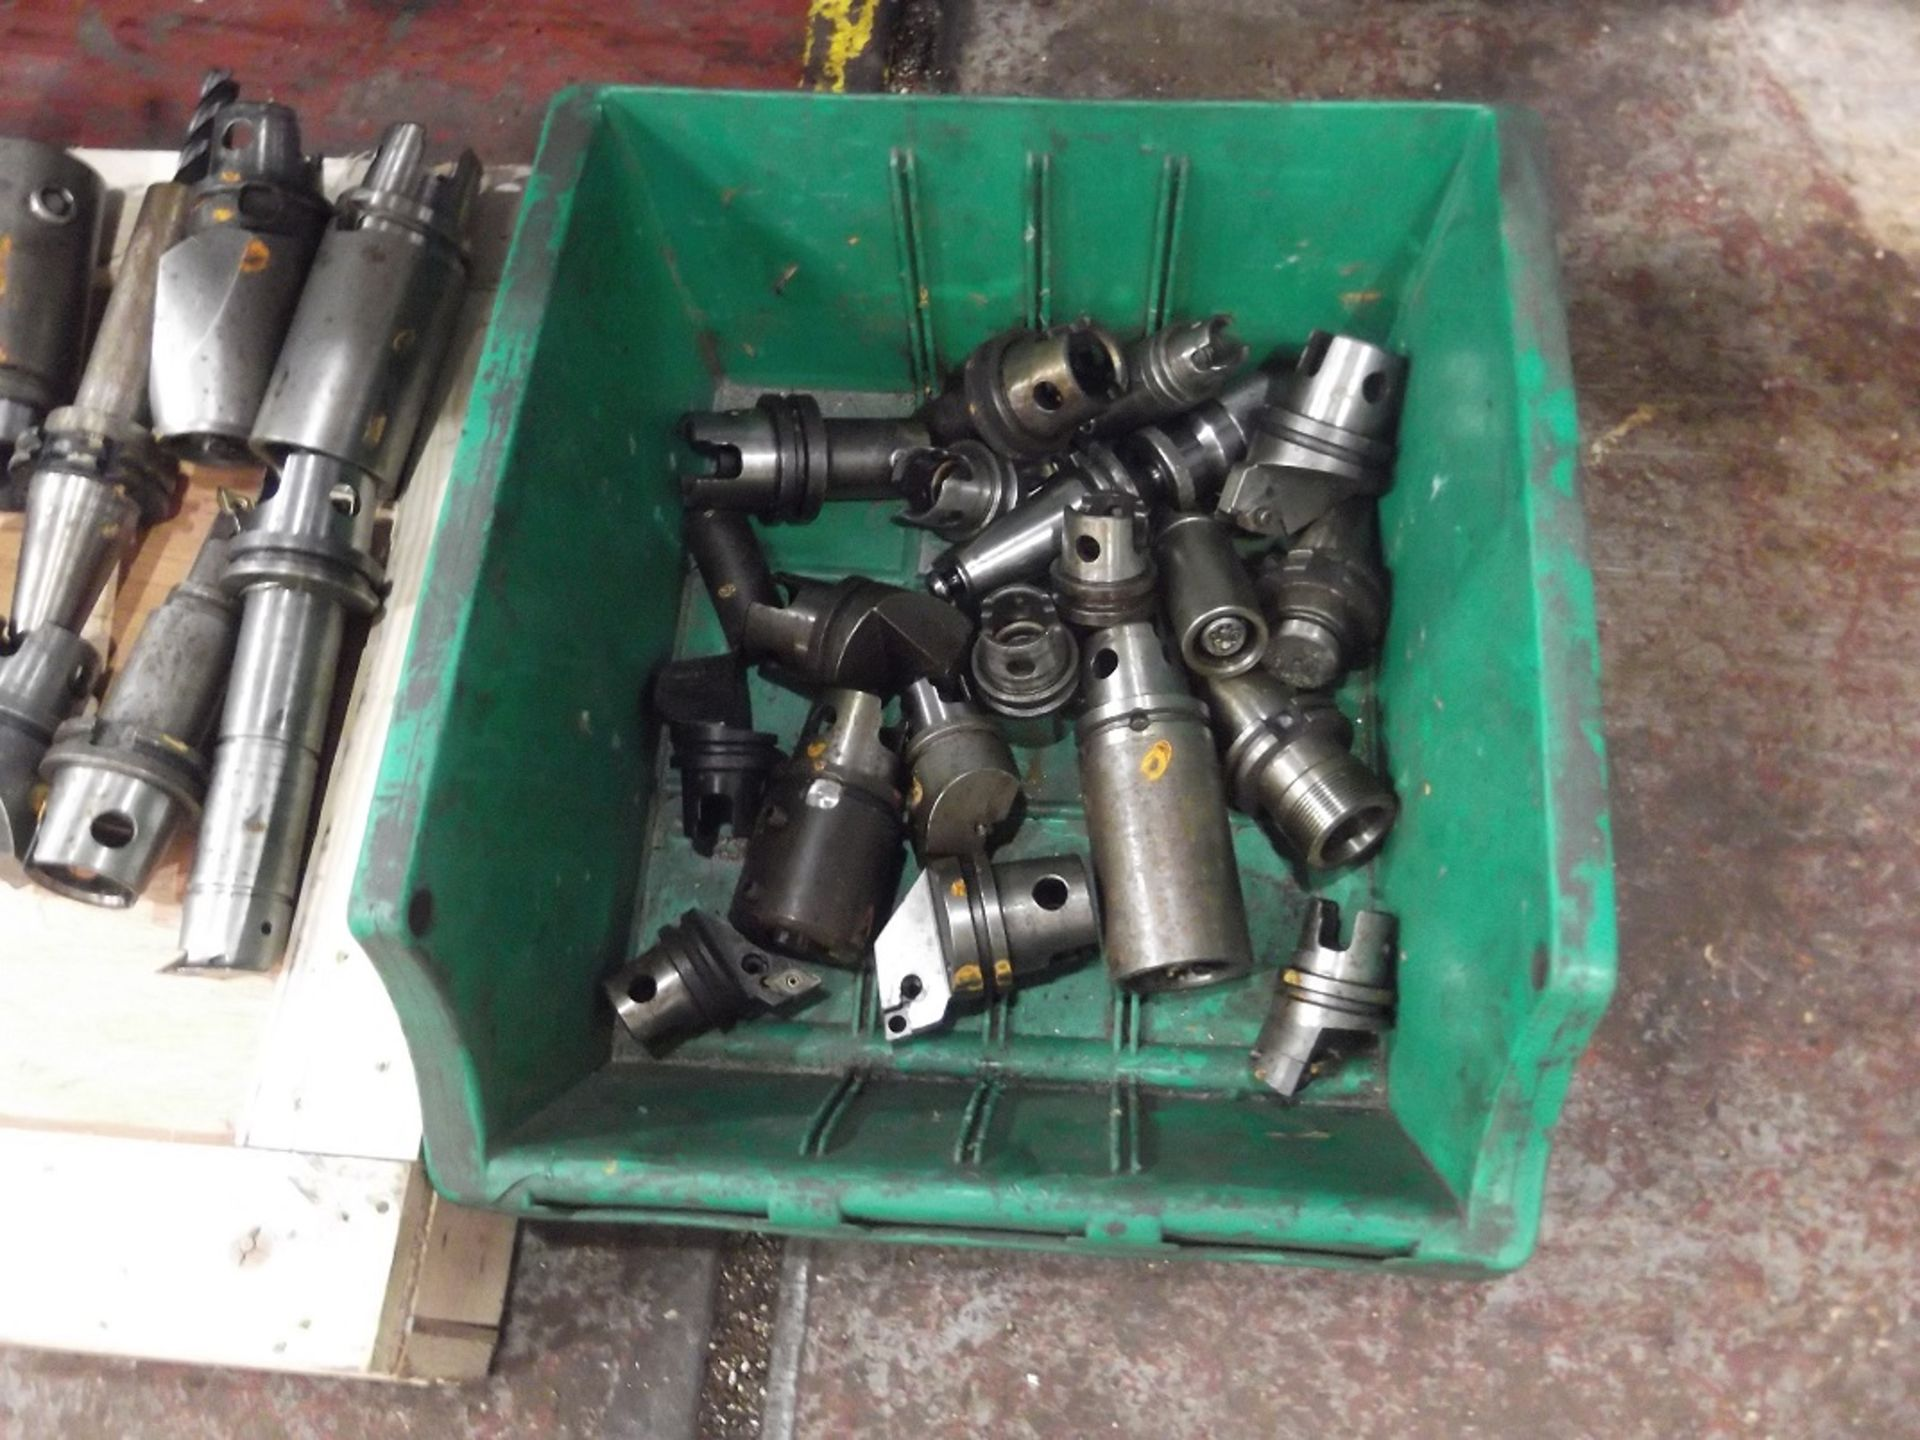 Los 1 - Mazak Integrex 35 Y CNC Lathe with driven tools